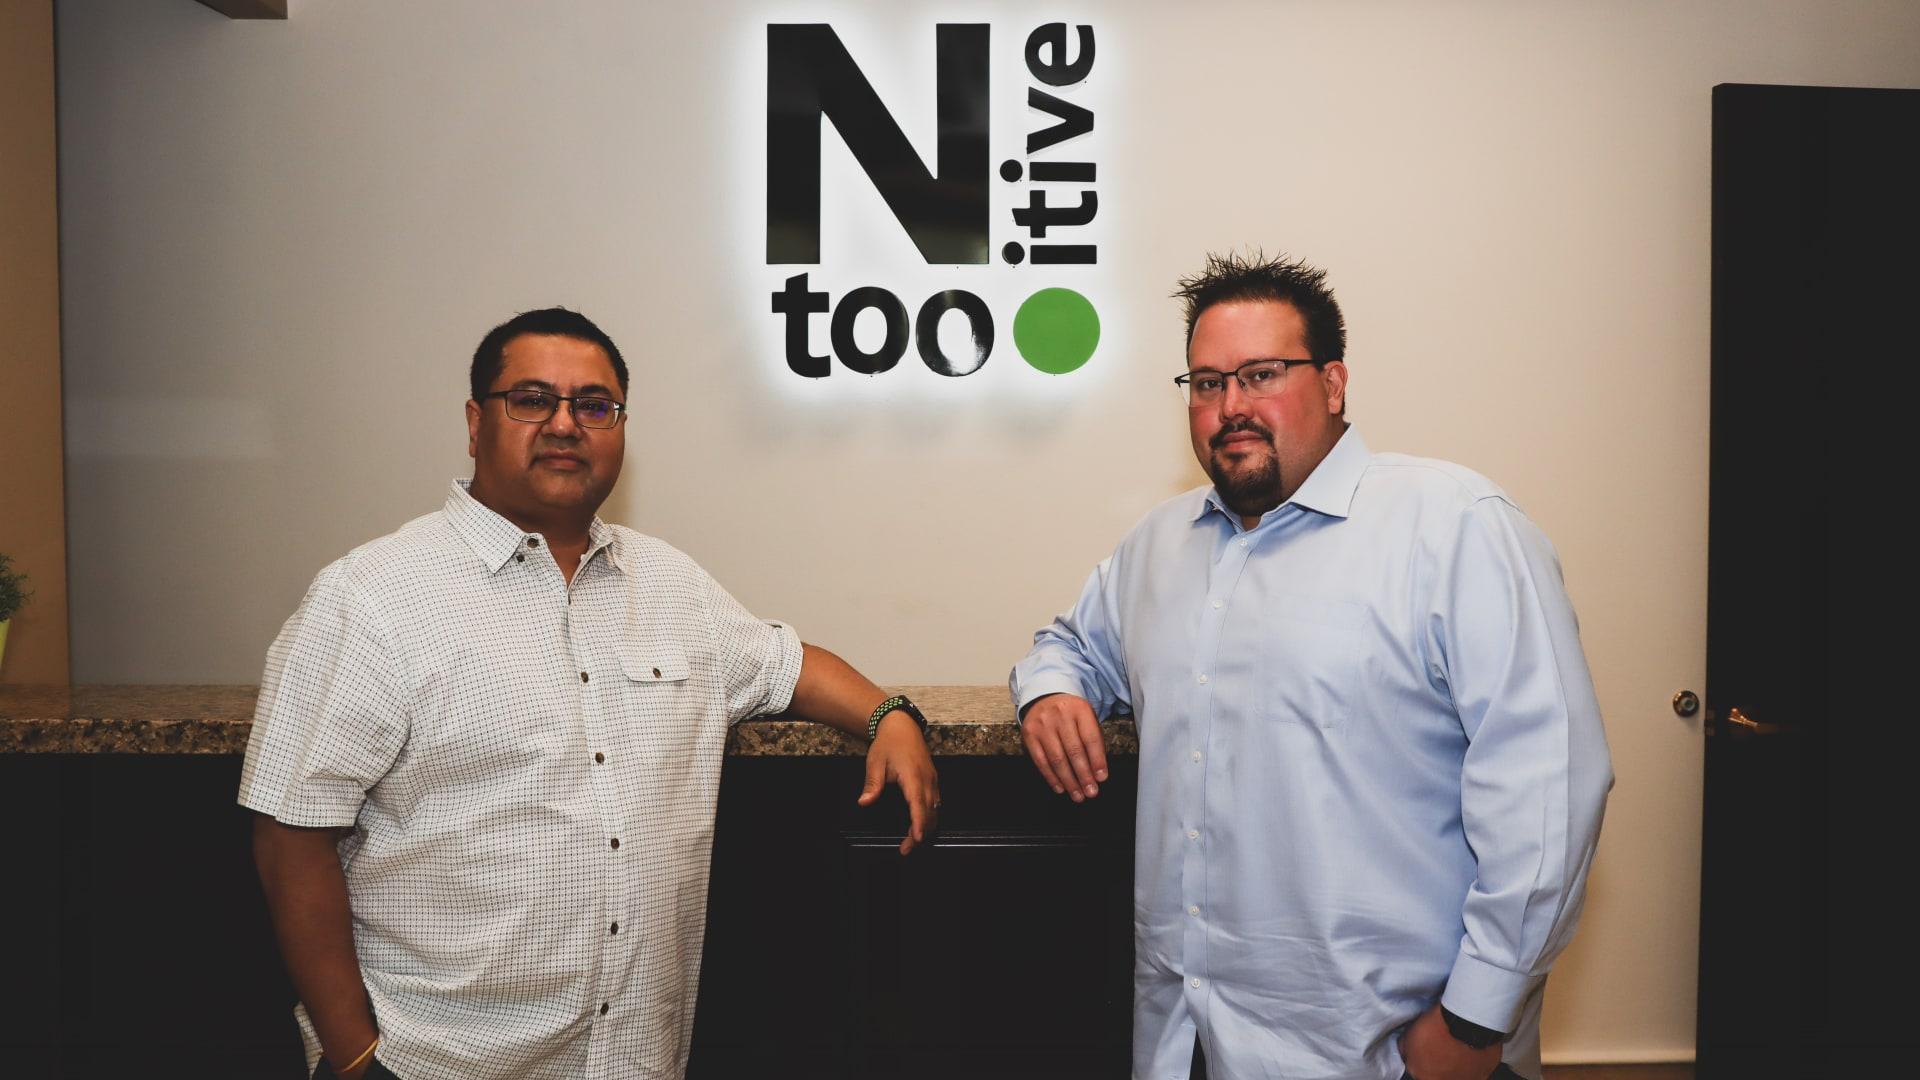 Co-founders of Ntooitive Digital: Ryan Christiansen (right) and Vikas Khorana